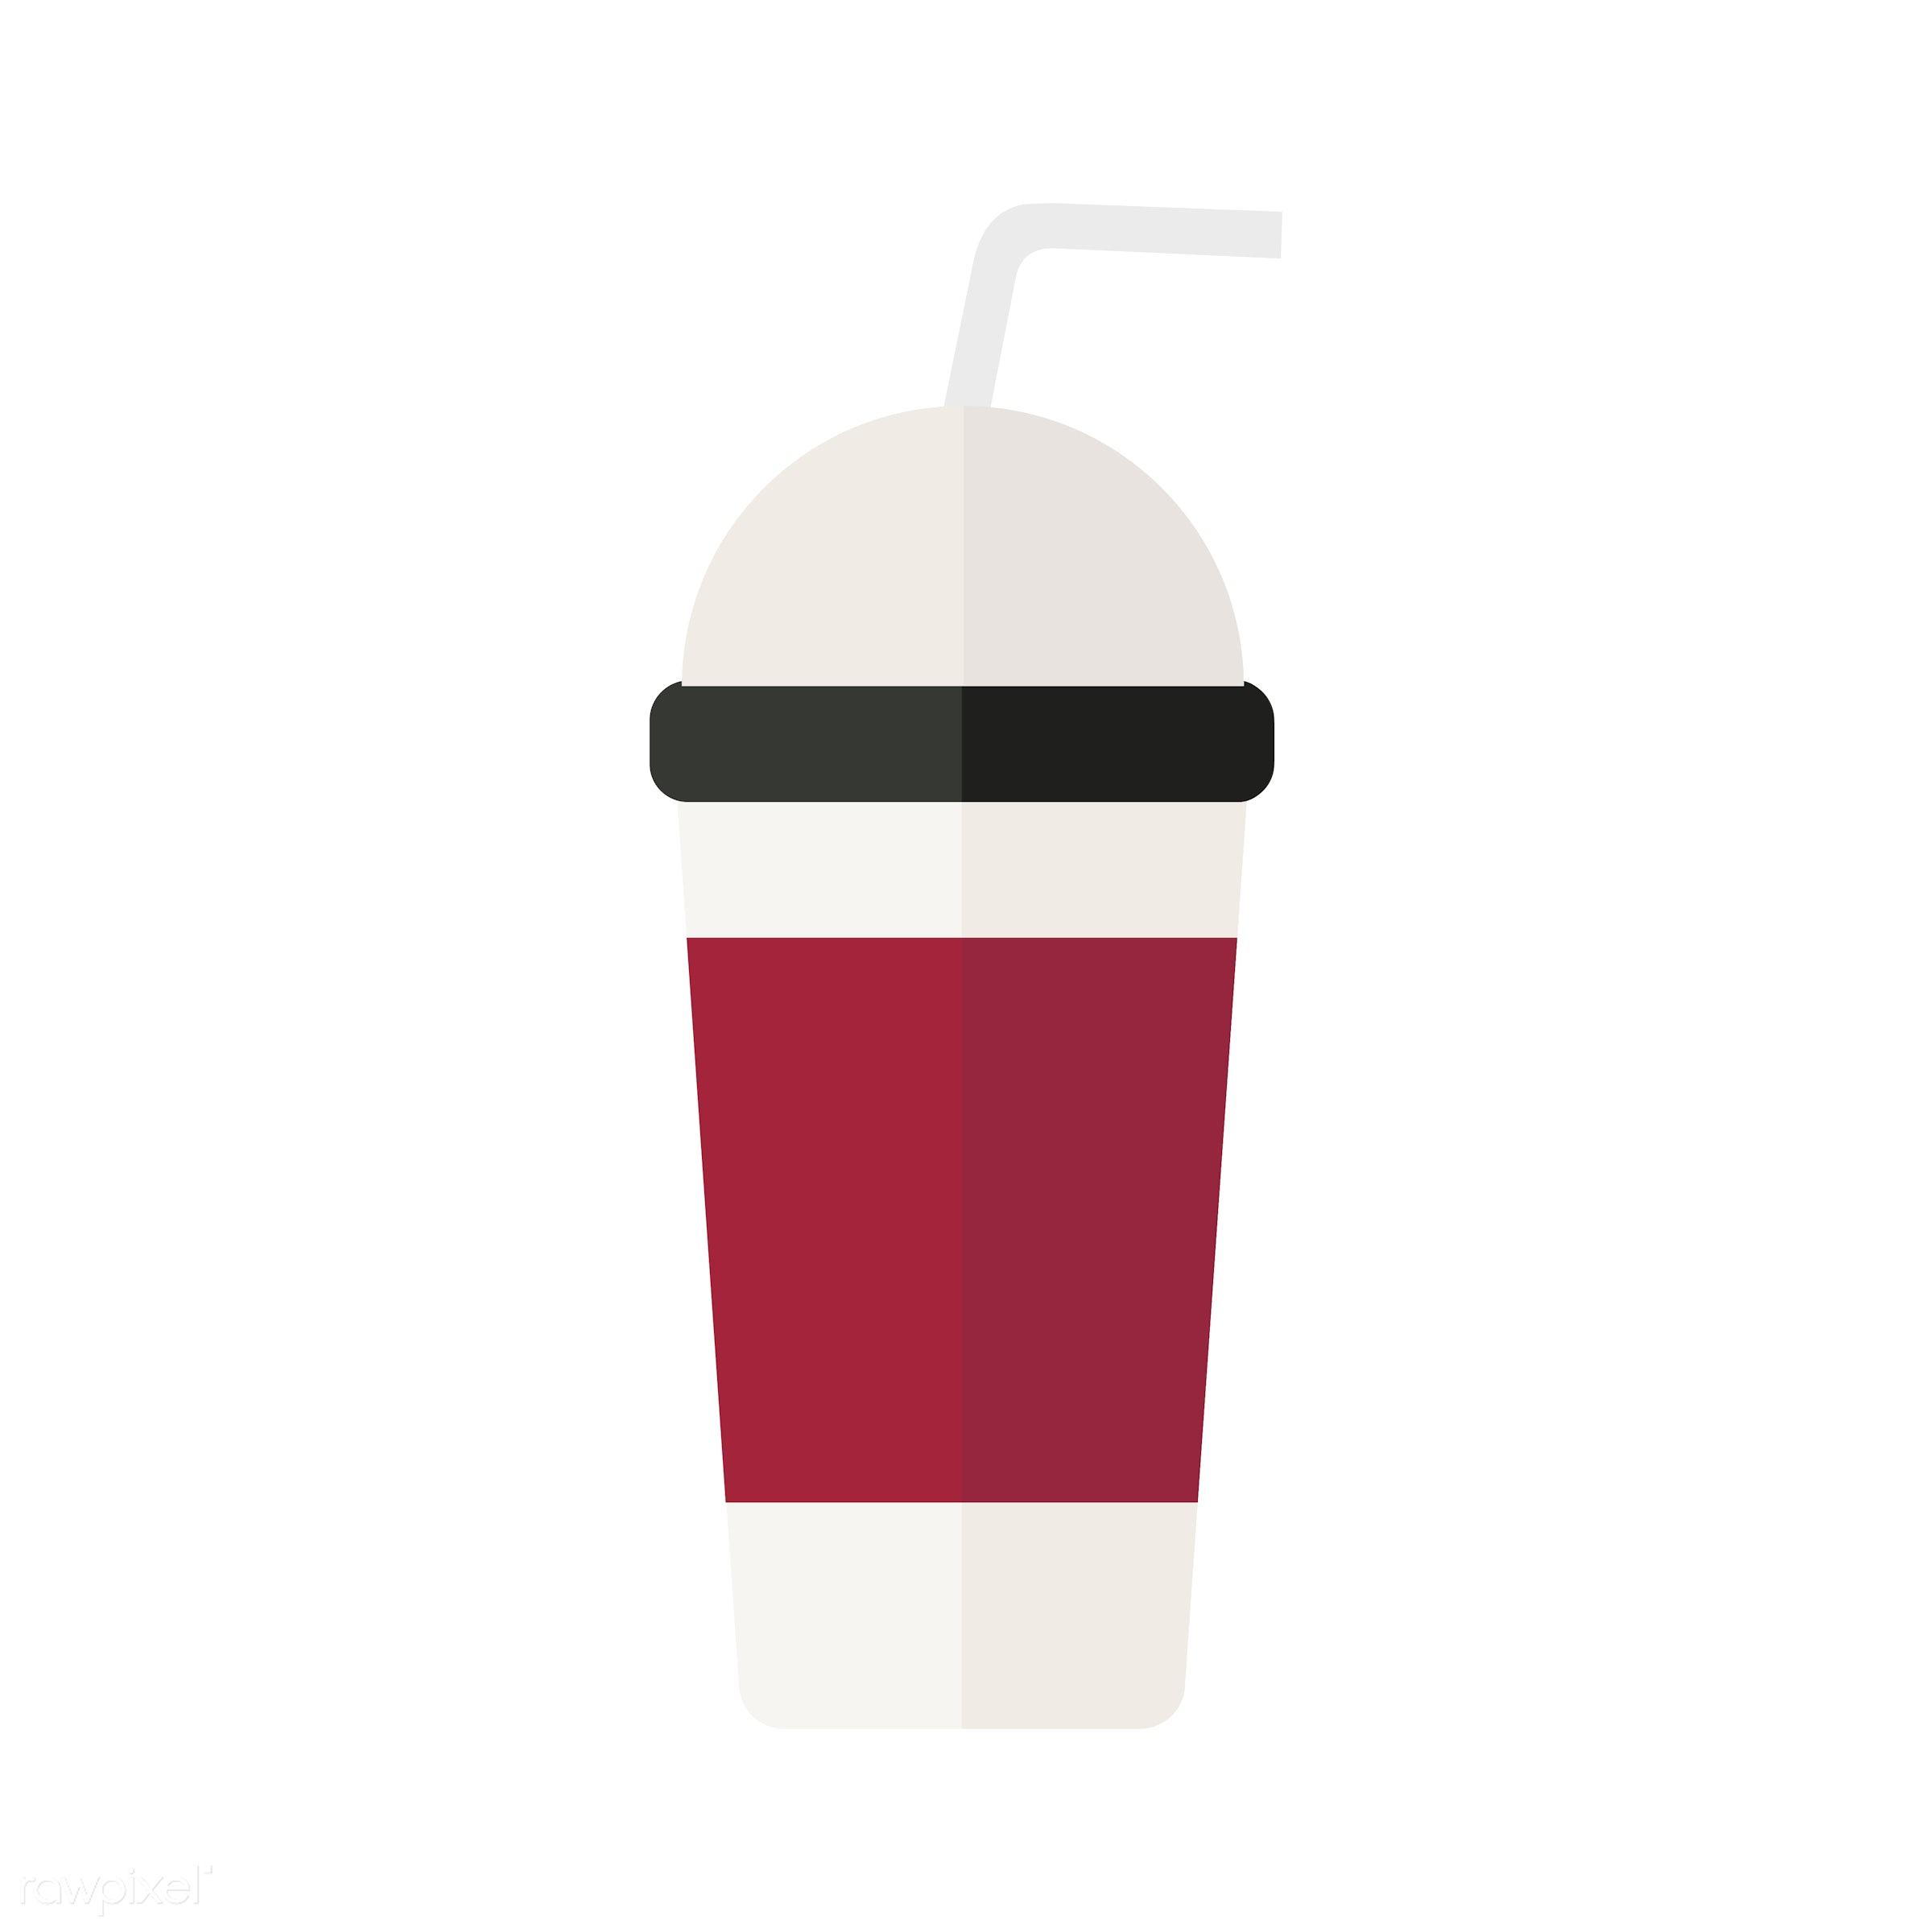 vector, graphic, illustration, icon, symbol, colorful, cute, drink, beverage, water, takeaway cup, takeaway, takeaway mug